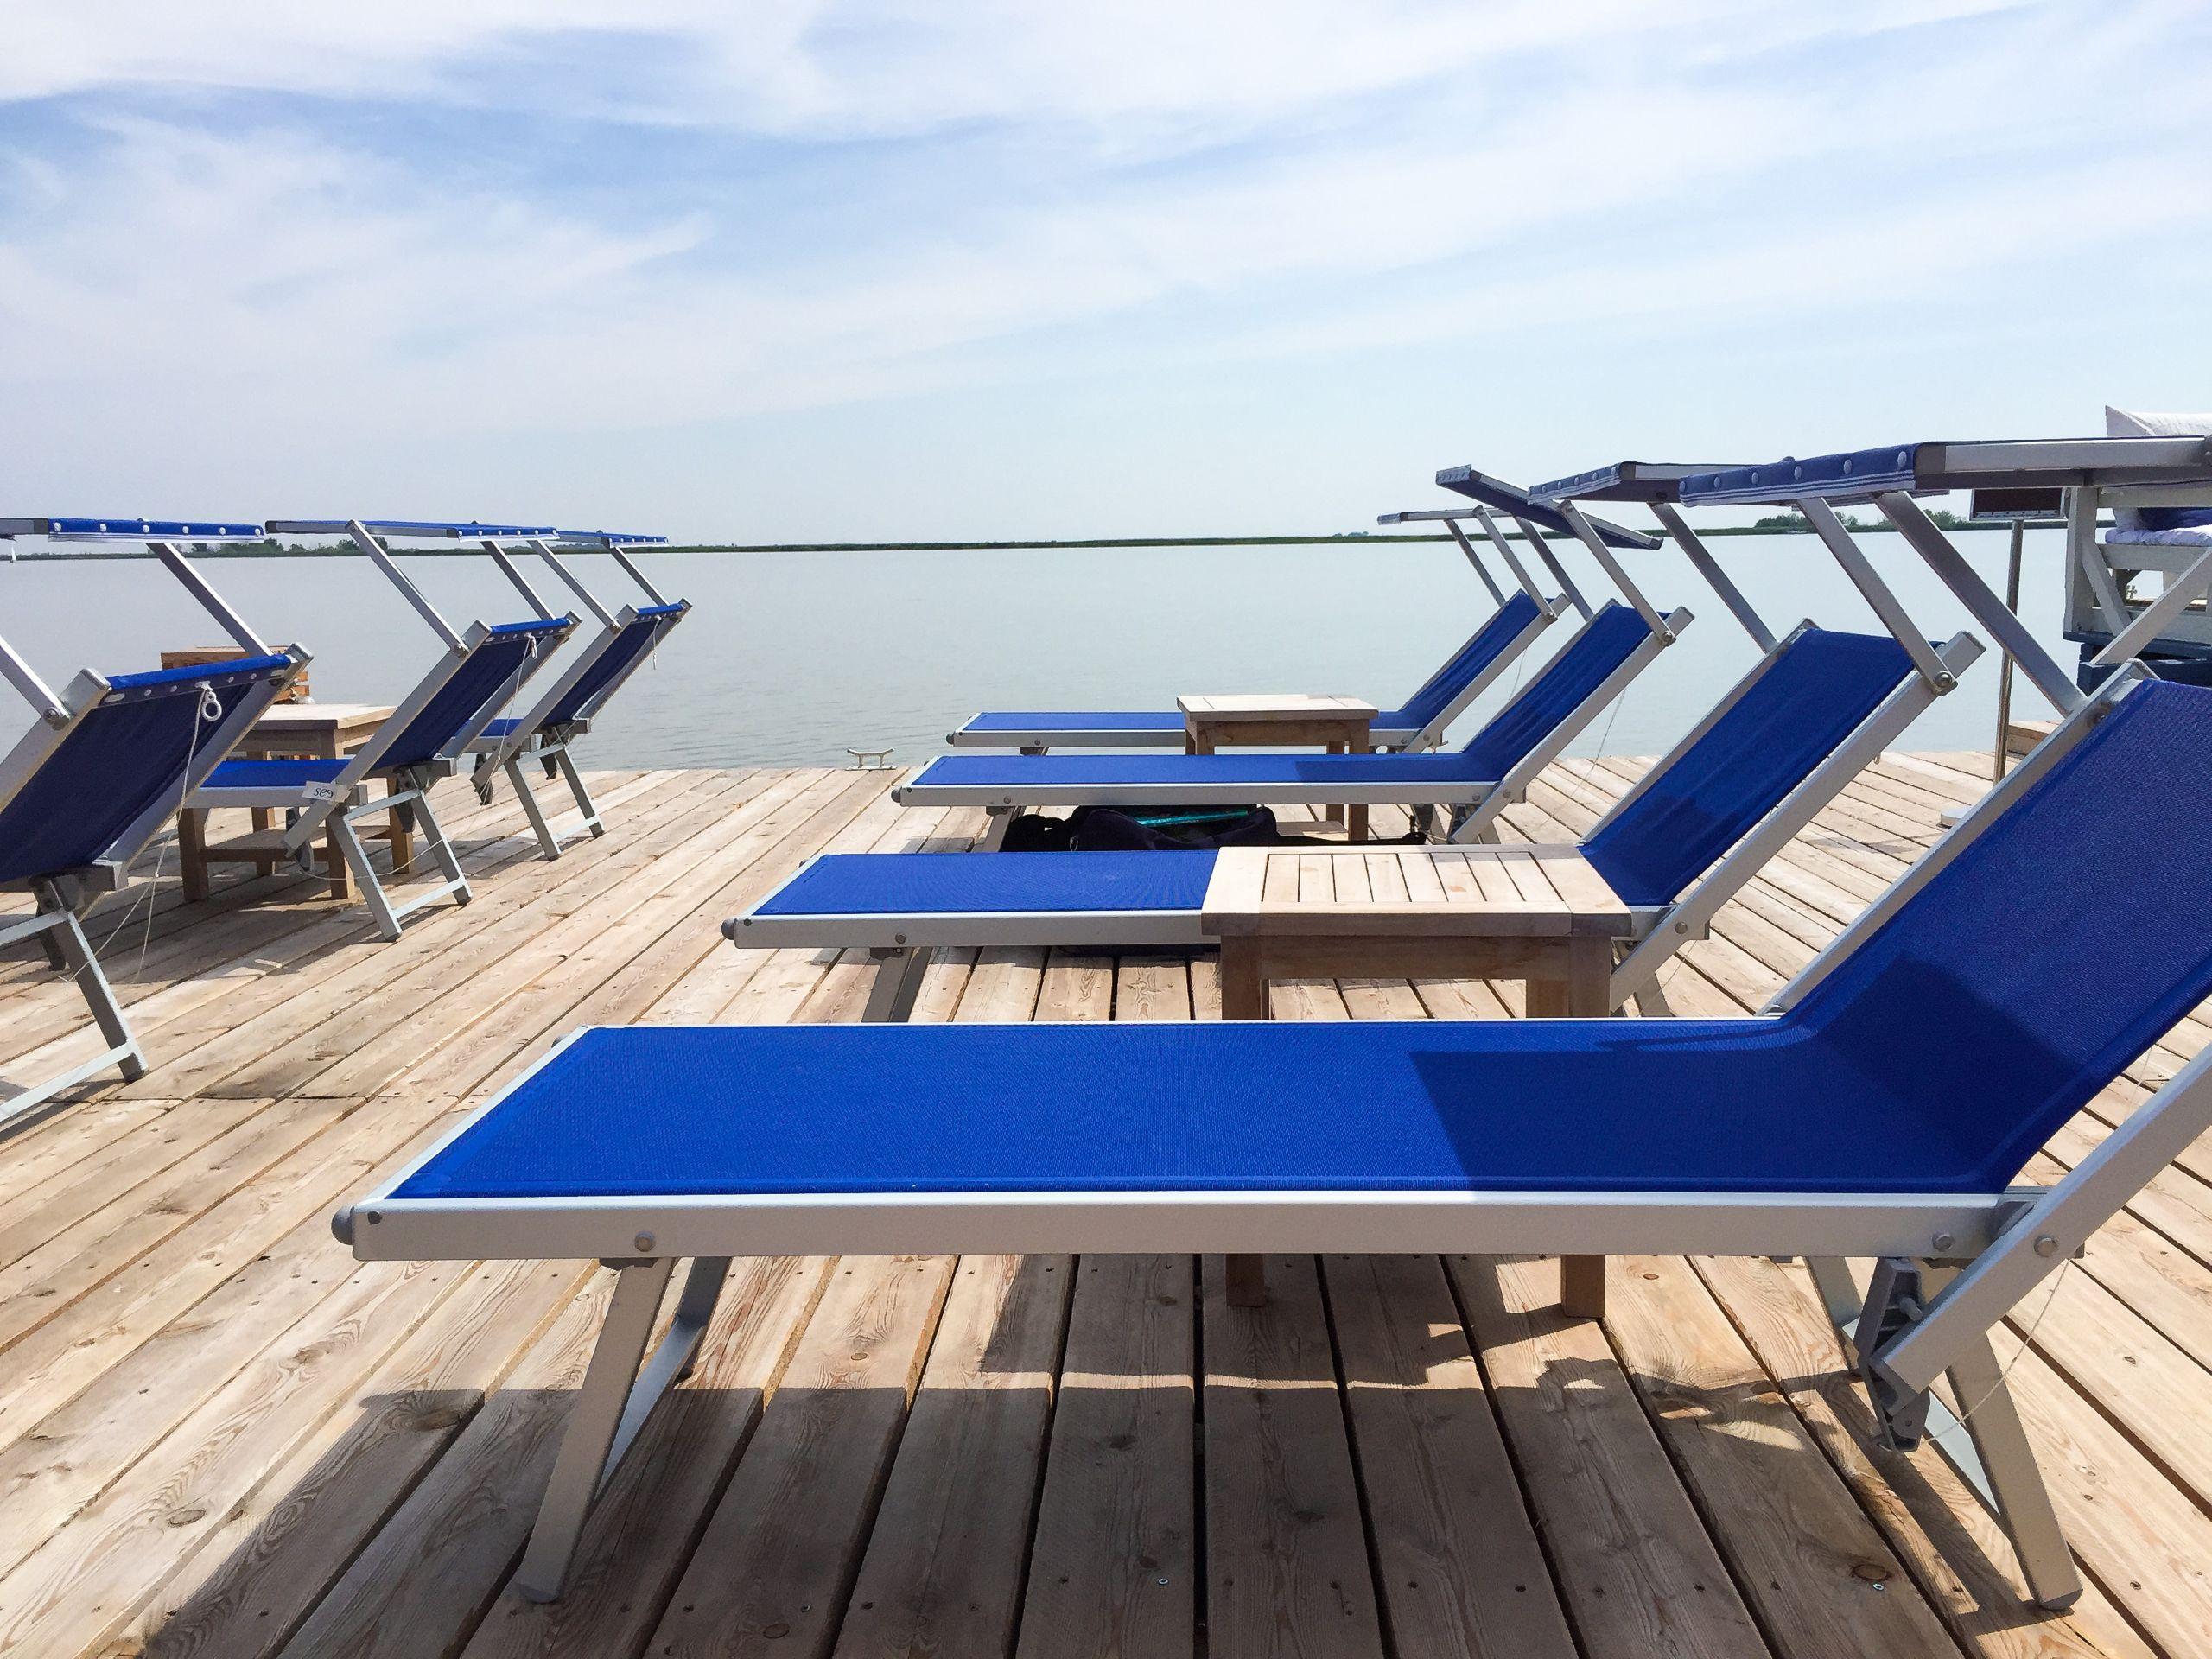 Urlaub Am See In Österreich | The Daily Dose